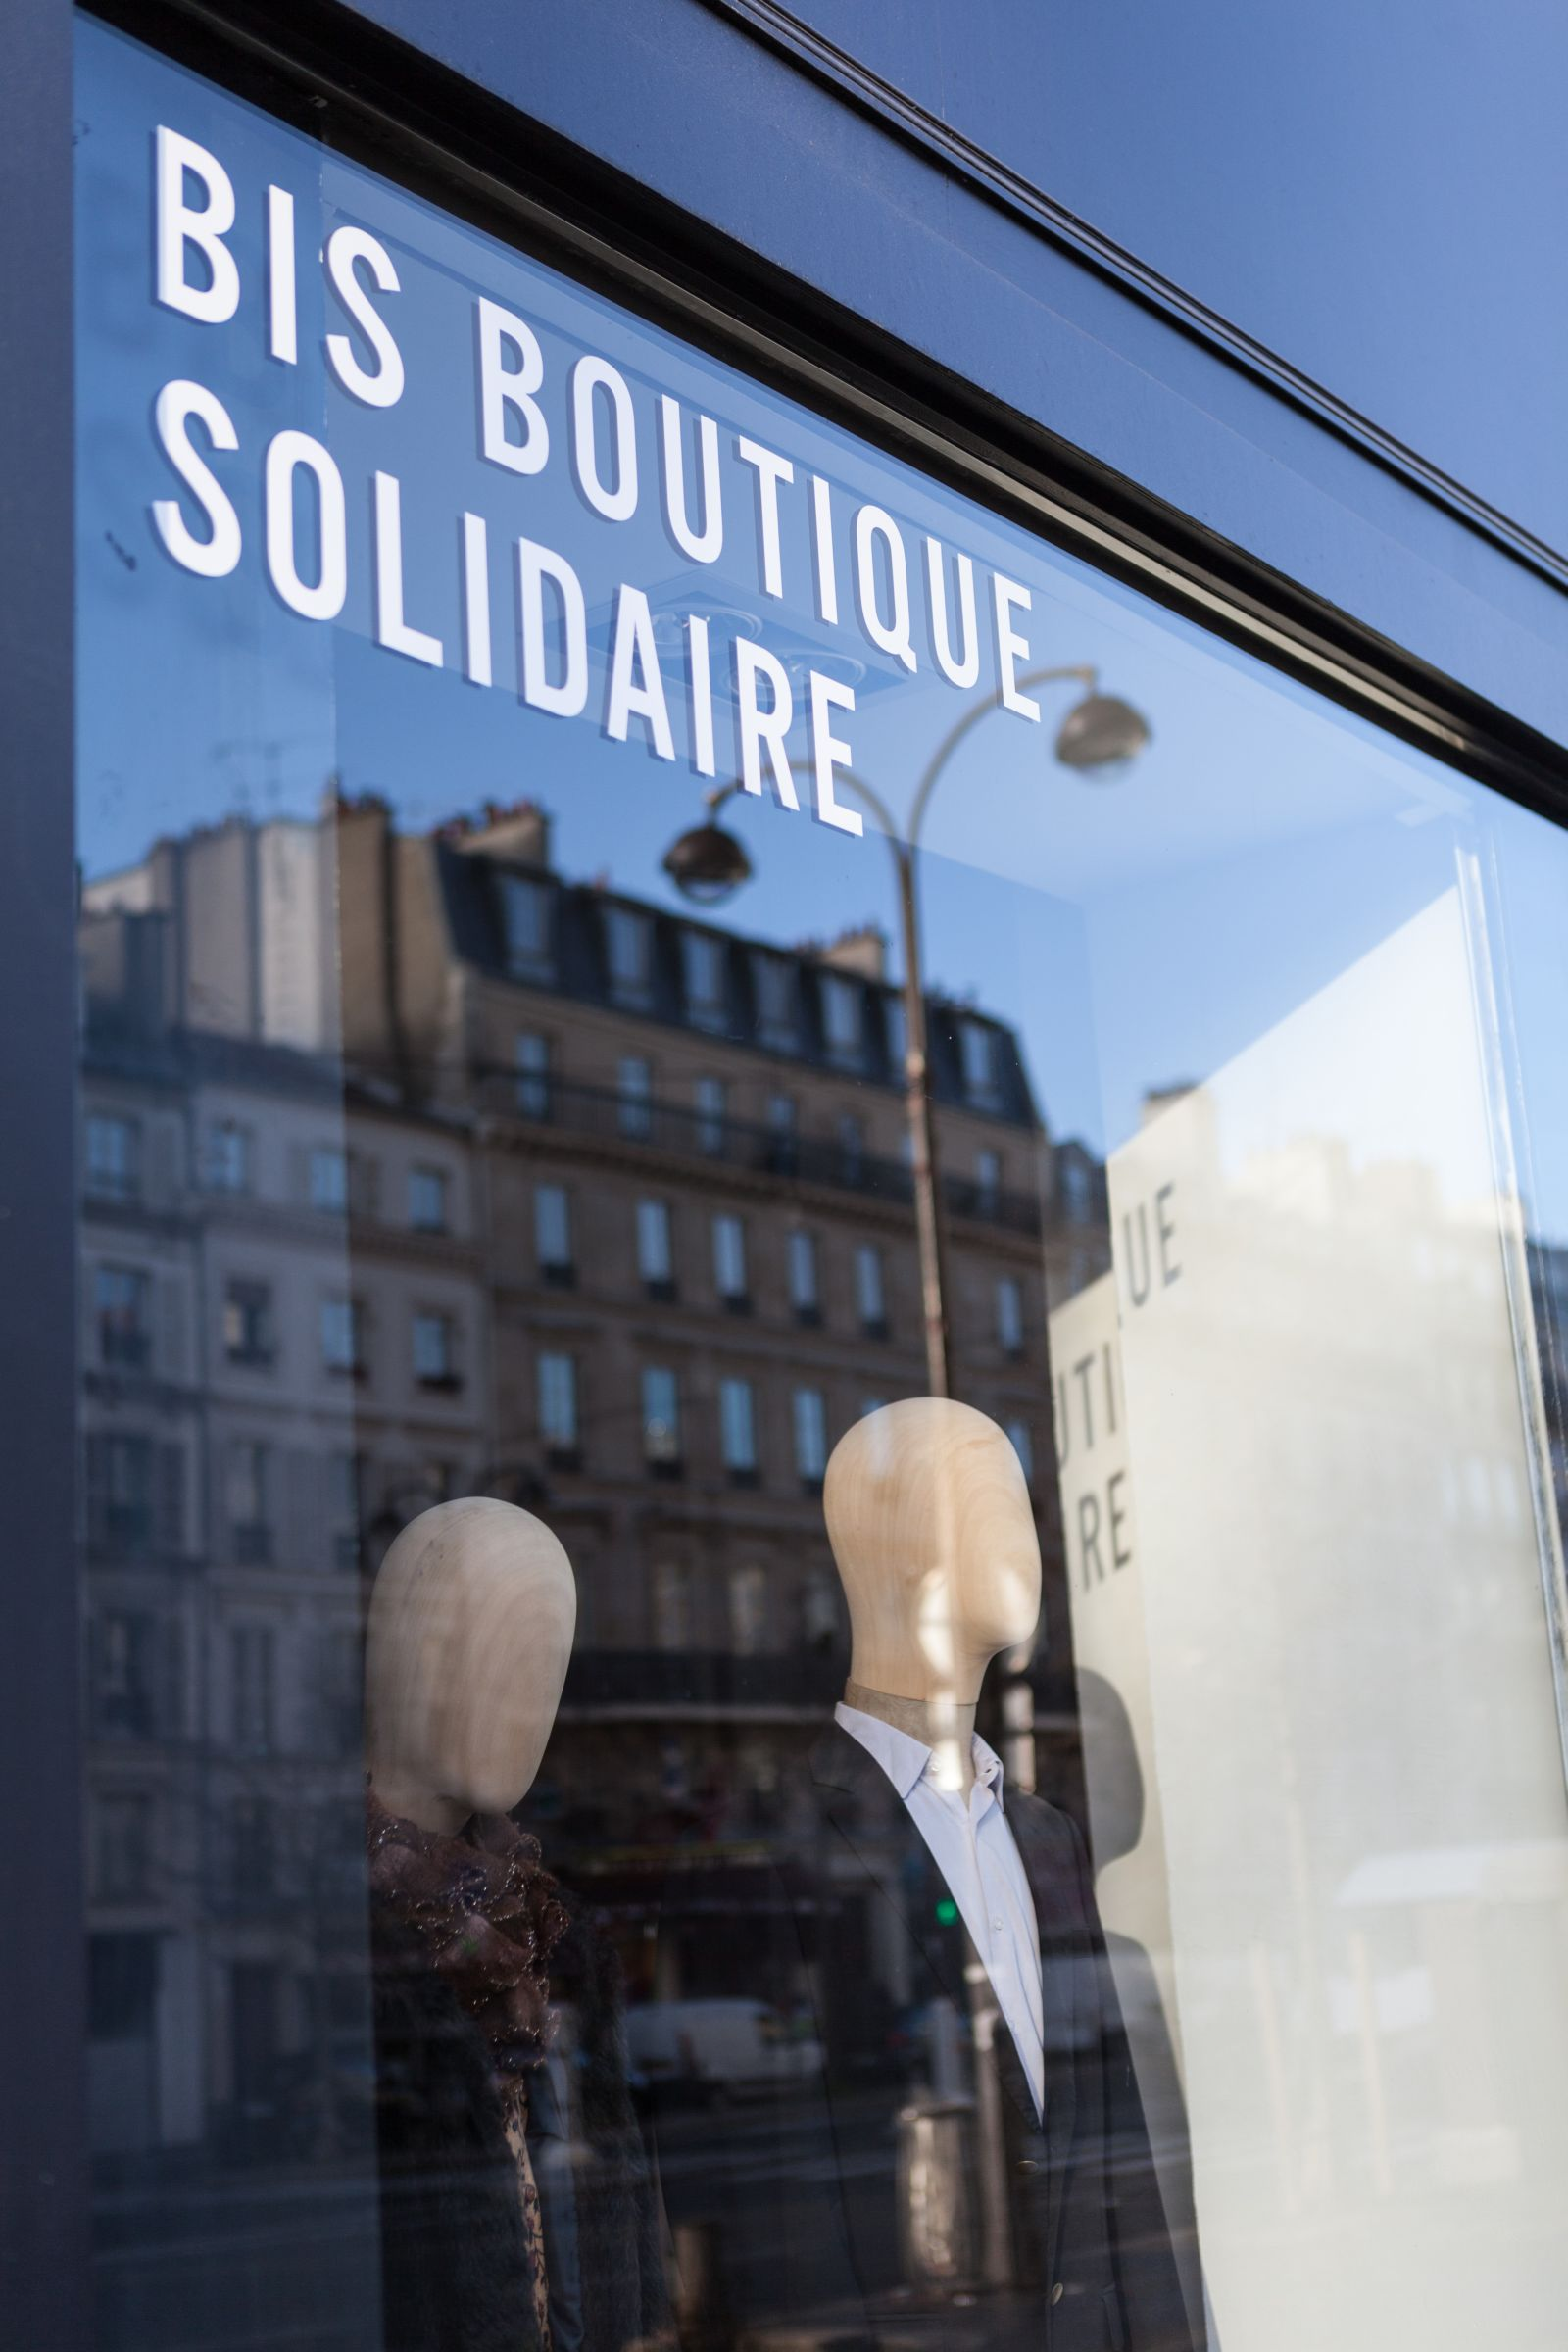 bis-boutique-solidaire_05